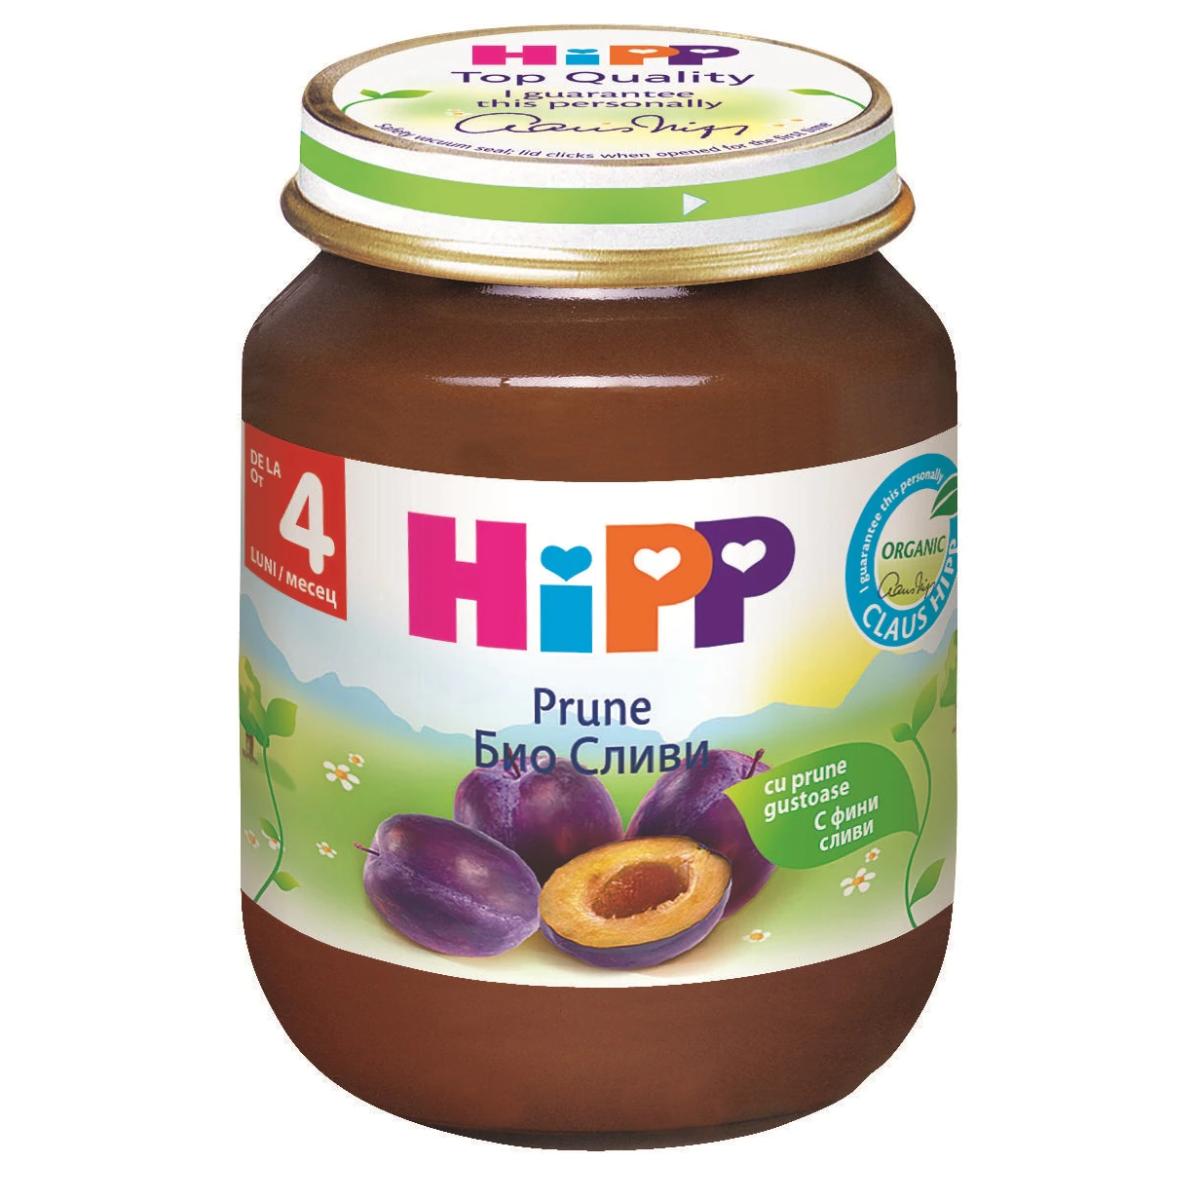 Piure de prune, +4 luni, 125 g, Hipp drmax.ro